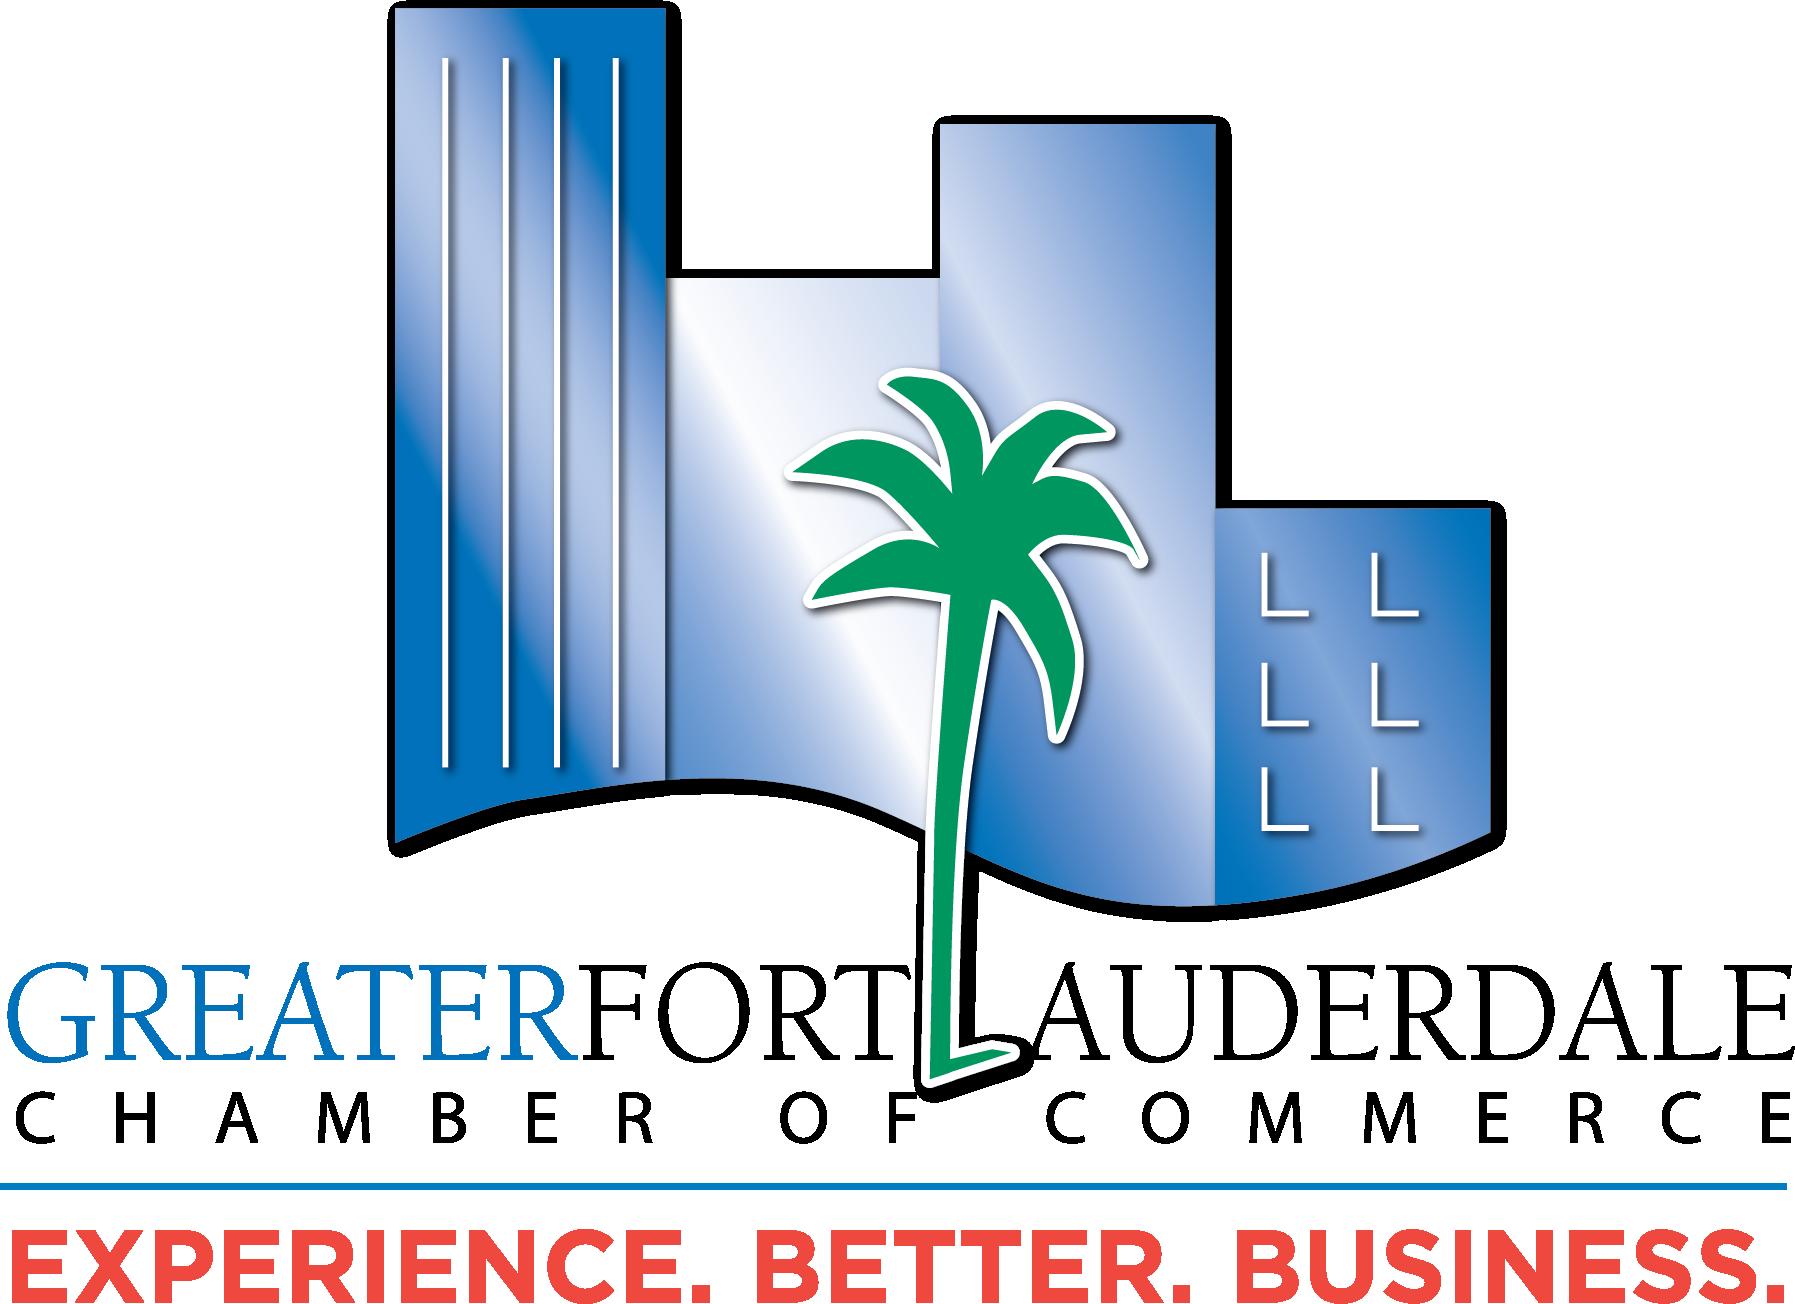 Greater Fort Lauderdale Chamber of Commerce (GFLCC)